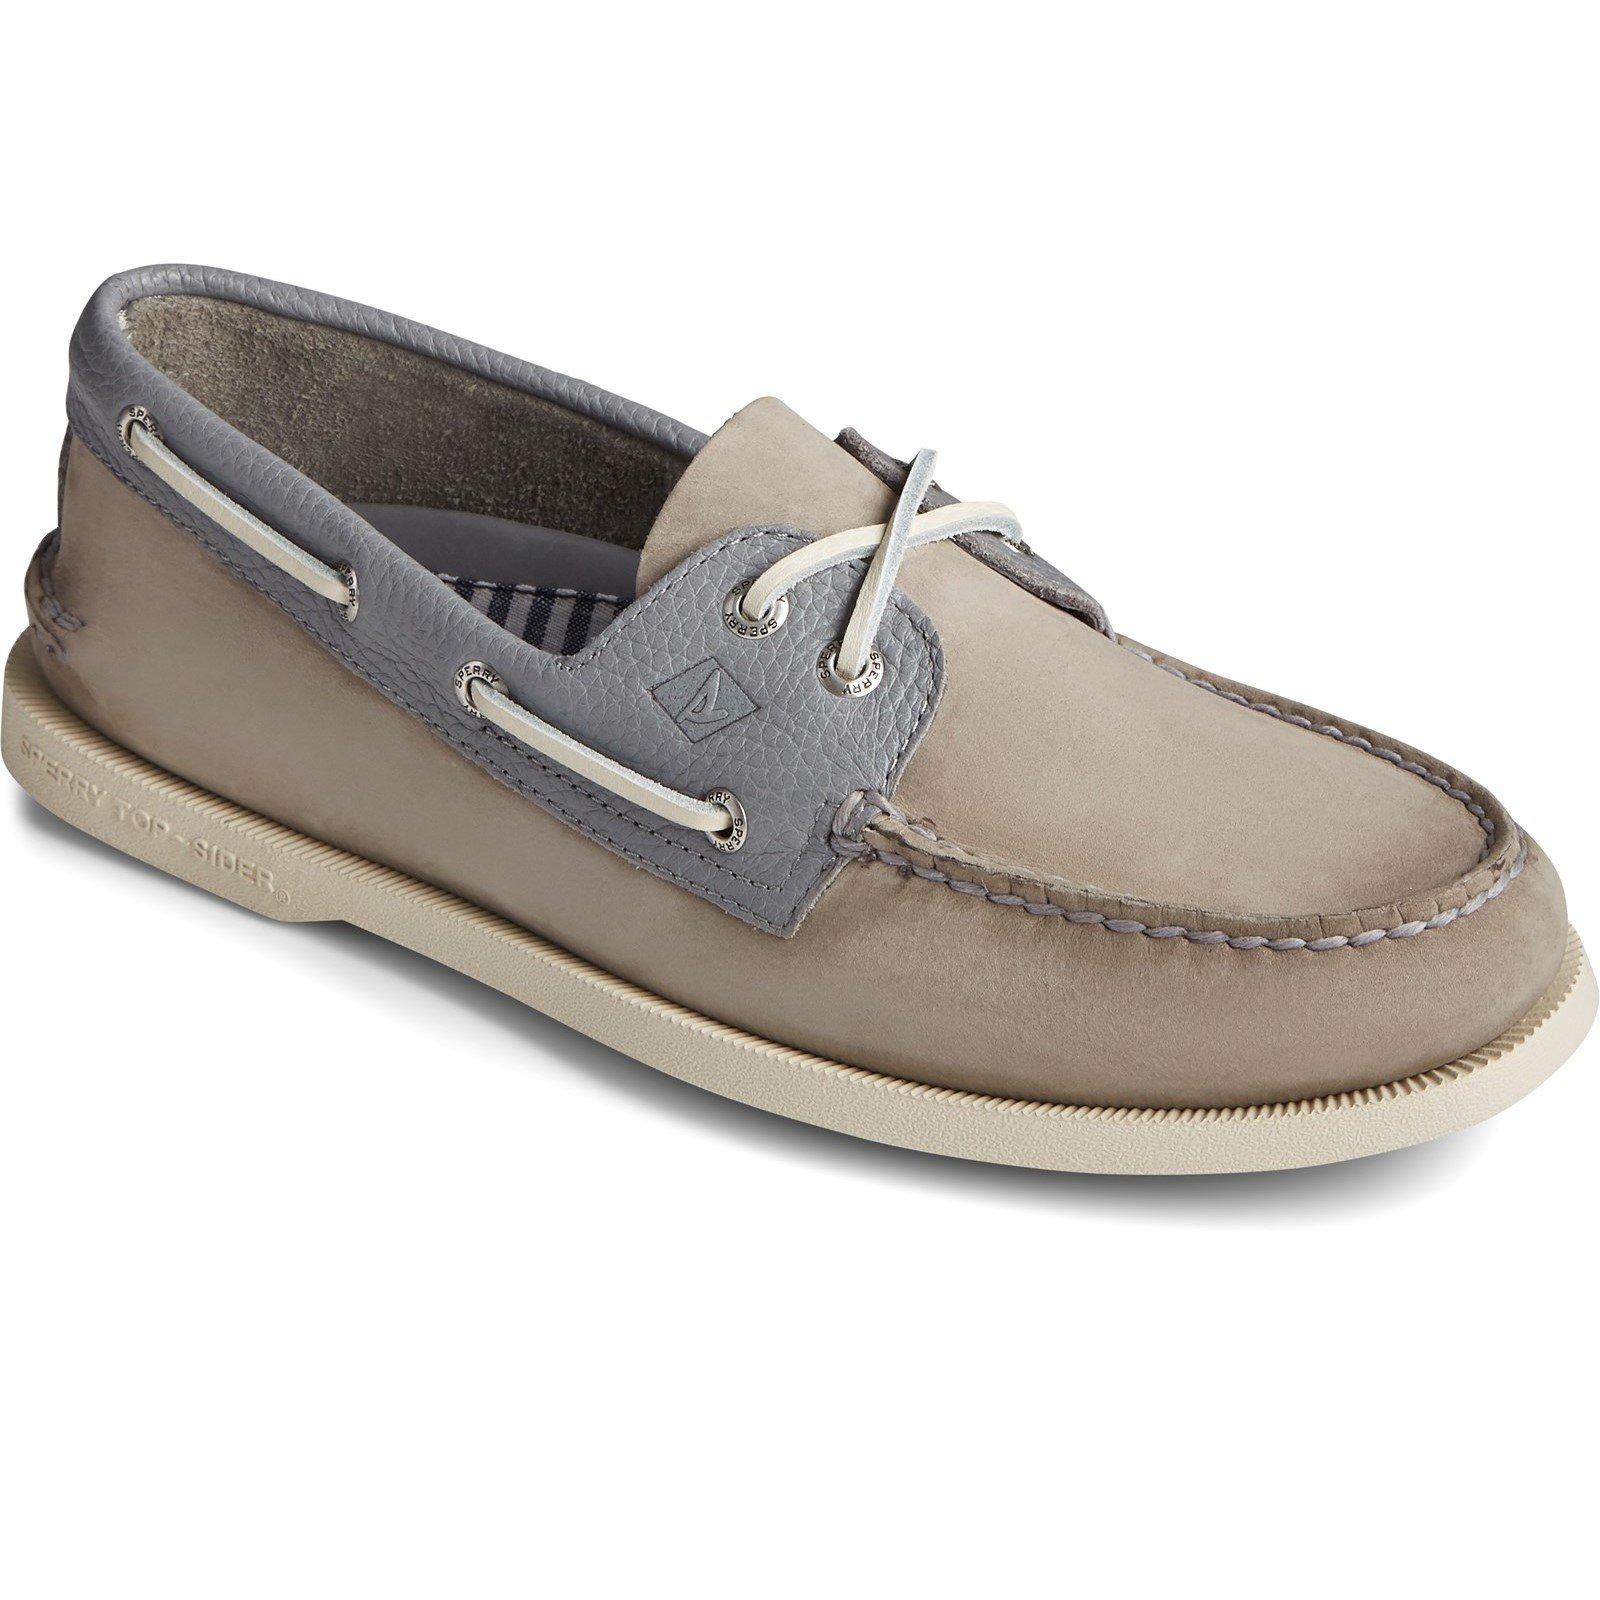 Sperry Men's A/O 2-Eye Nubuck Boat Shoe Various Colours 32920 - Grey 9